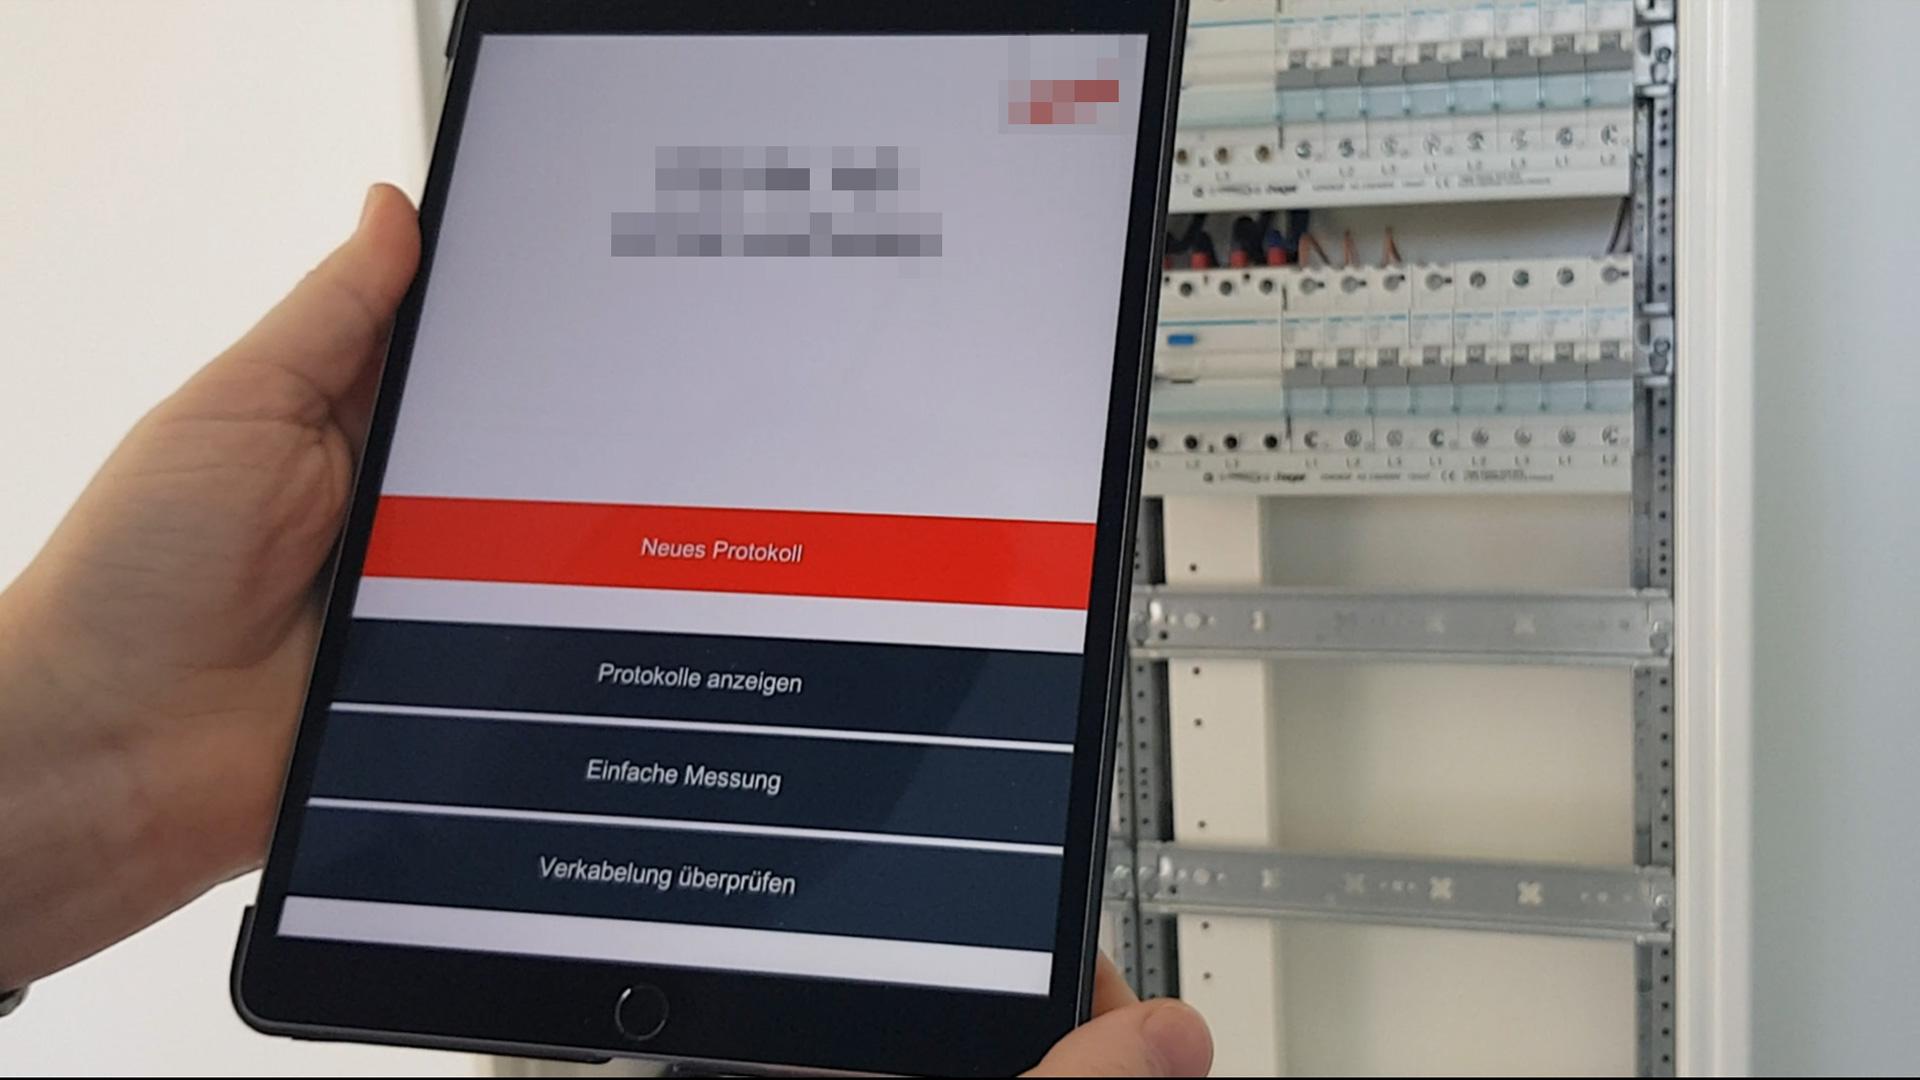 switchgear-assistent-triboot-technologies-01